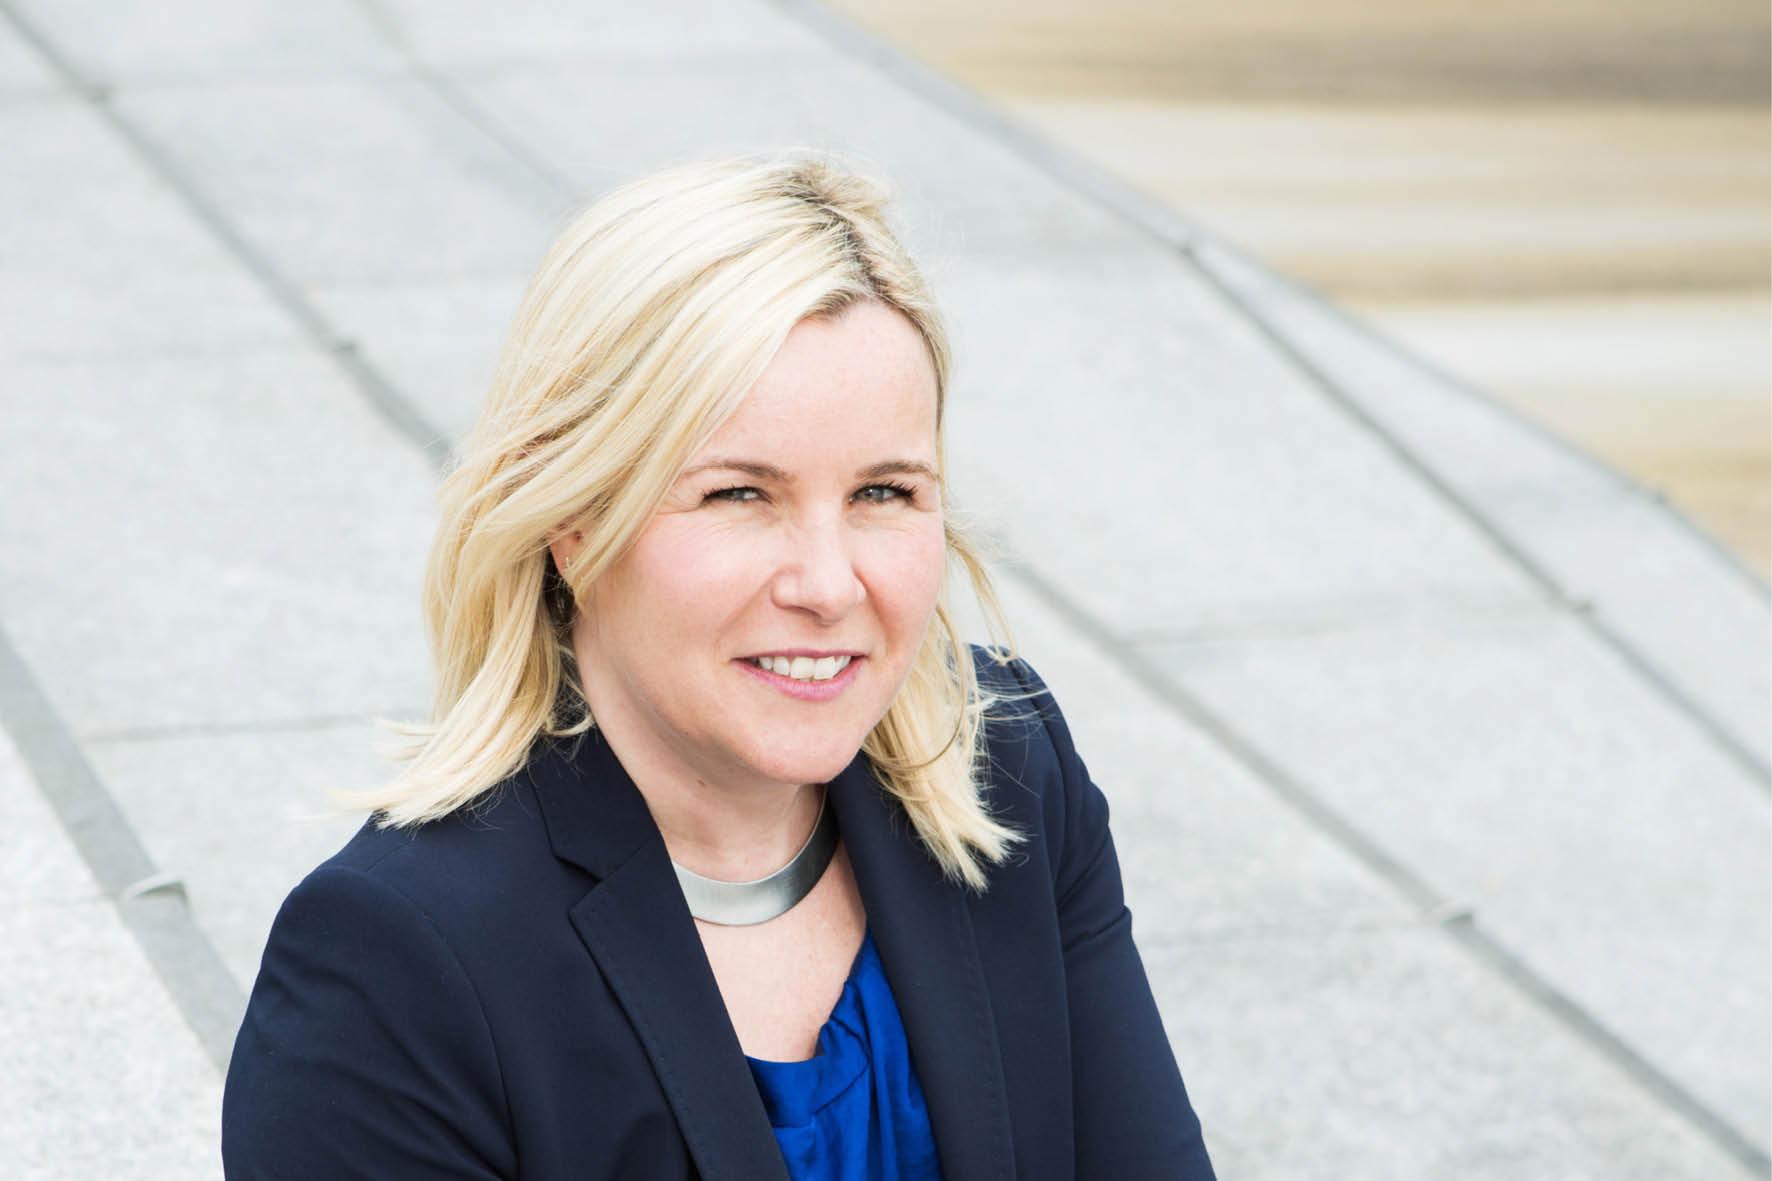 Sarah Butler - Co-founder and partner